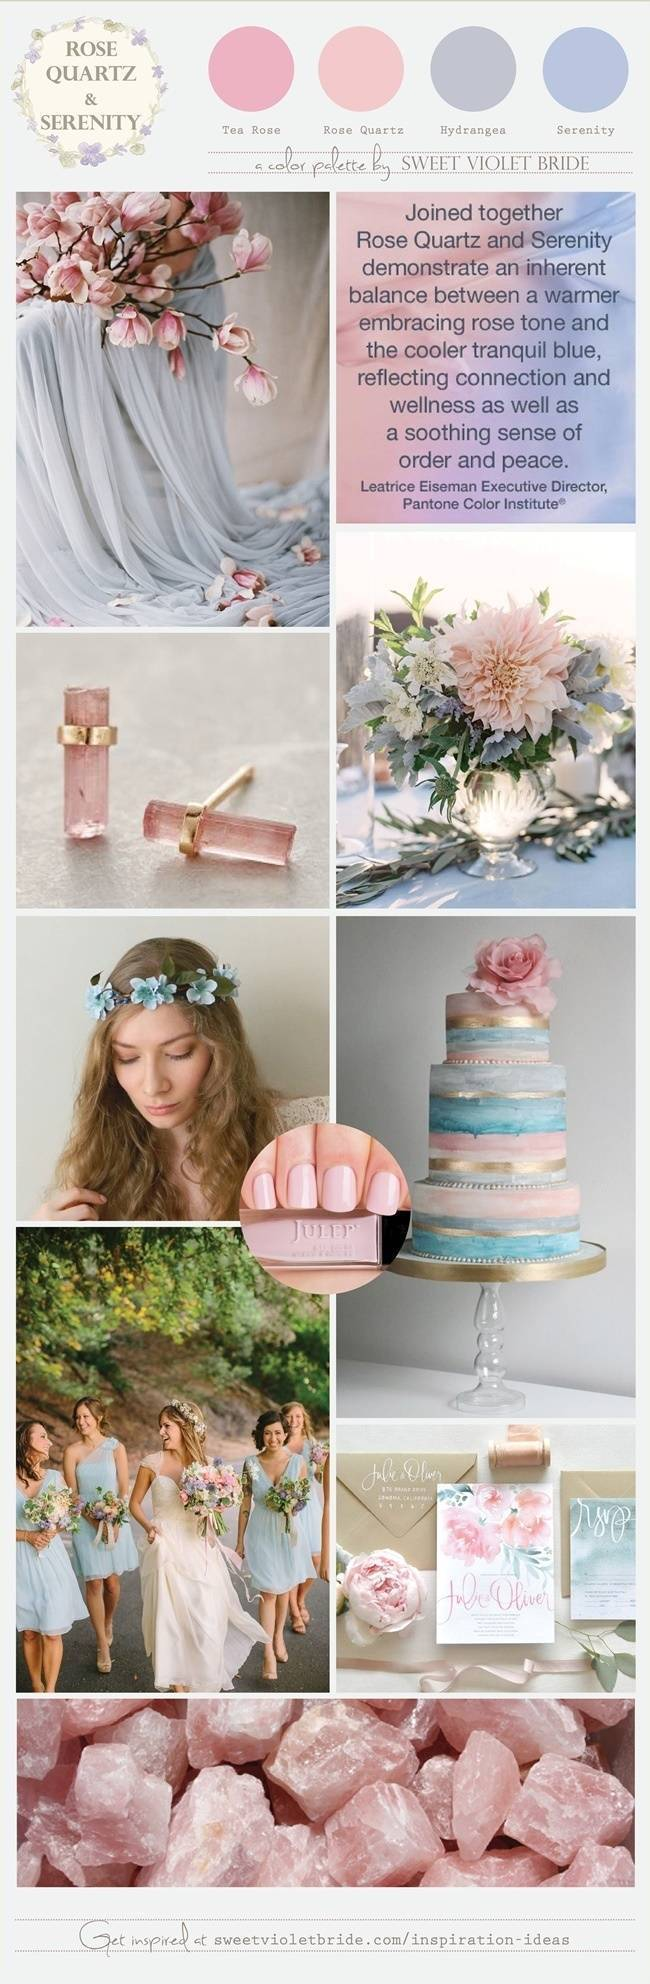 Rose Quartz and Serenity Wedding Palette